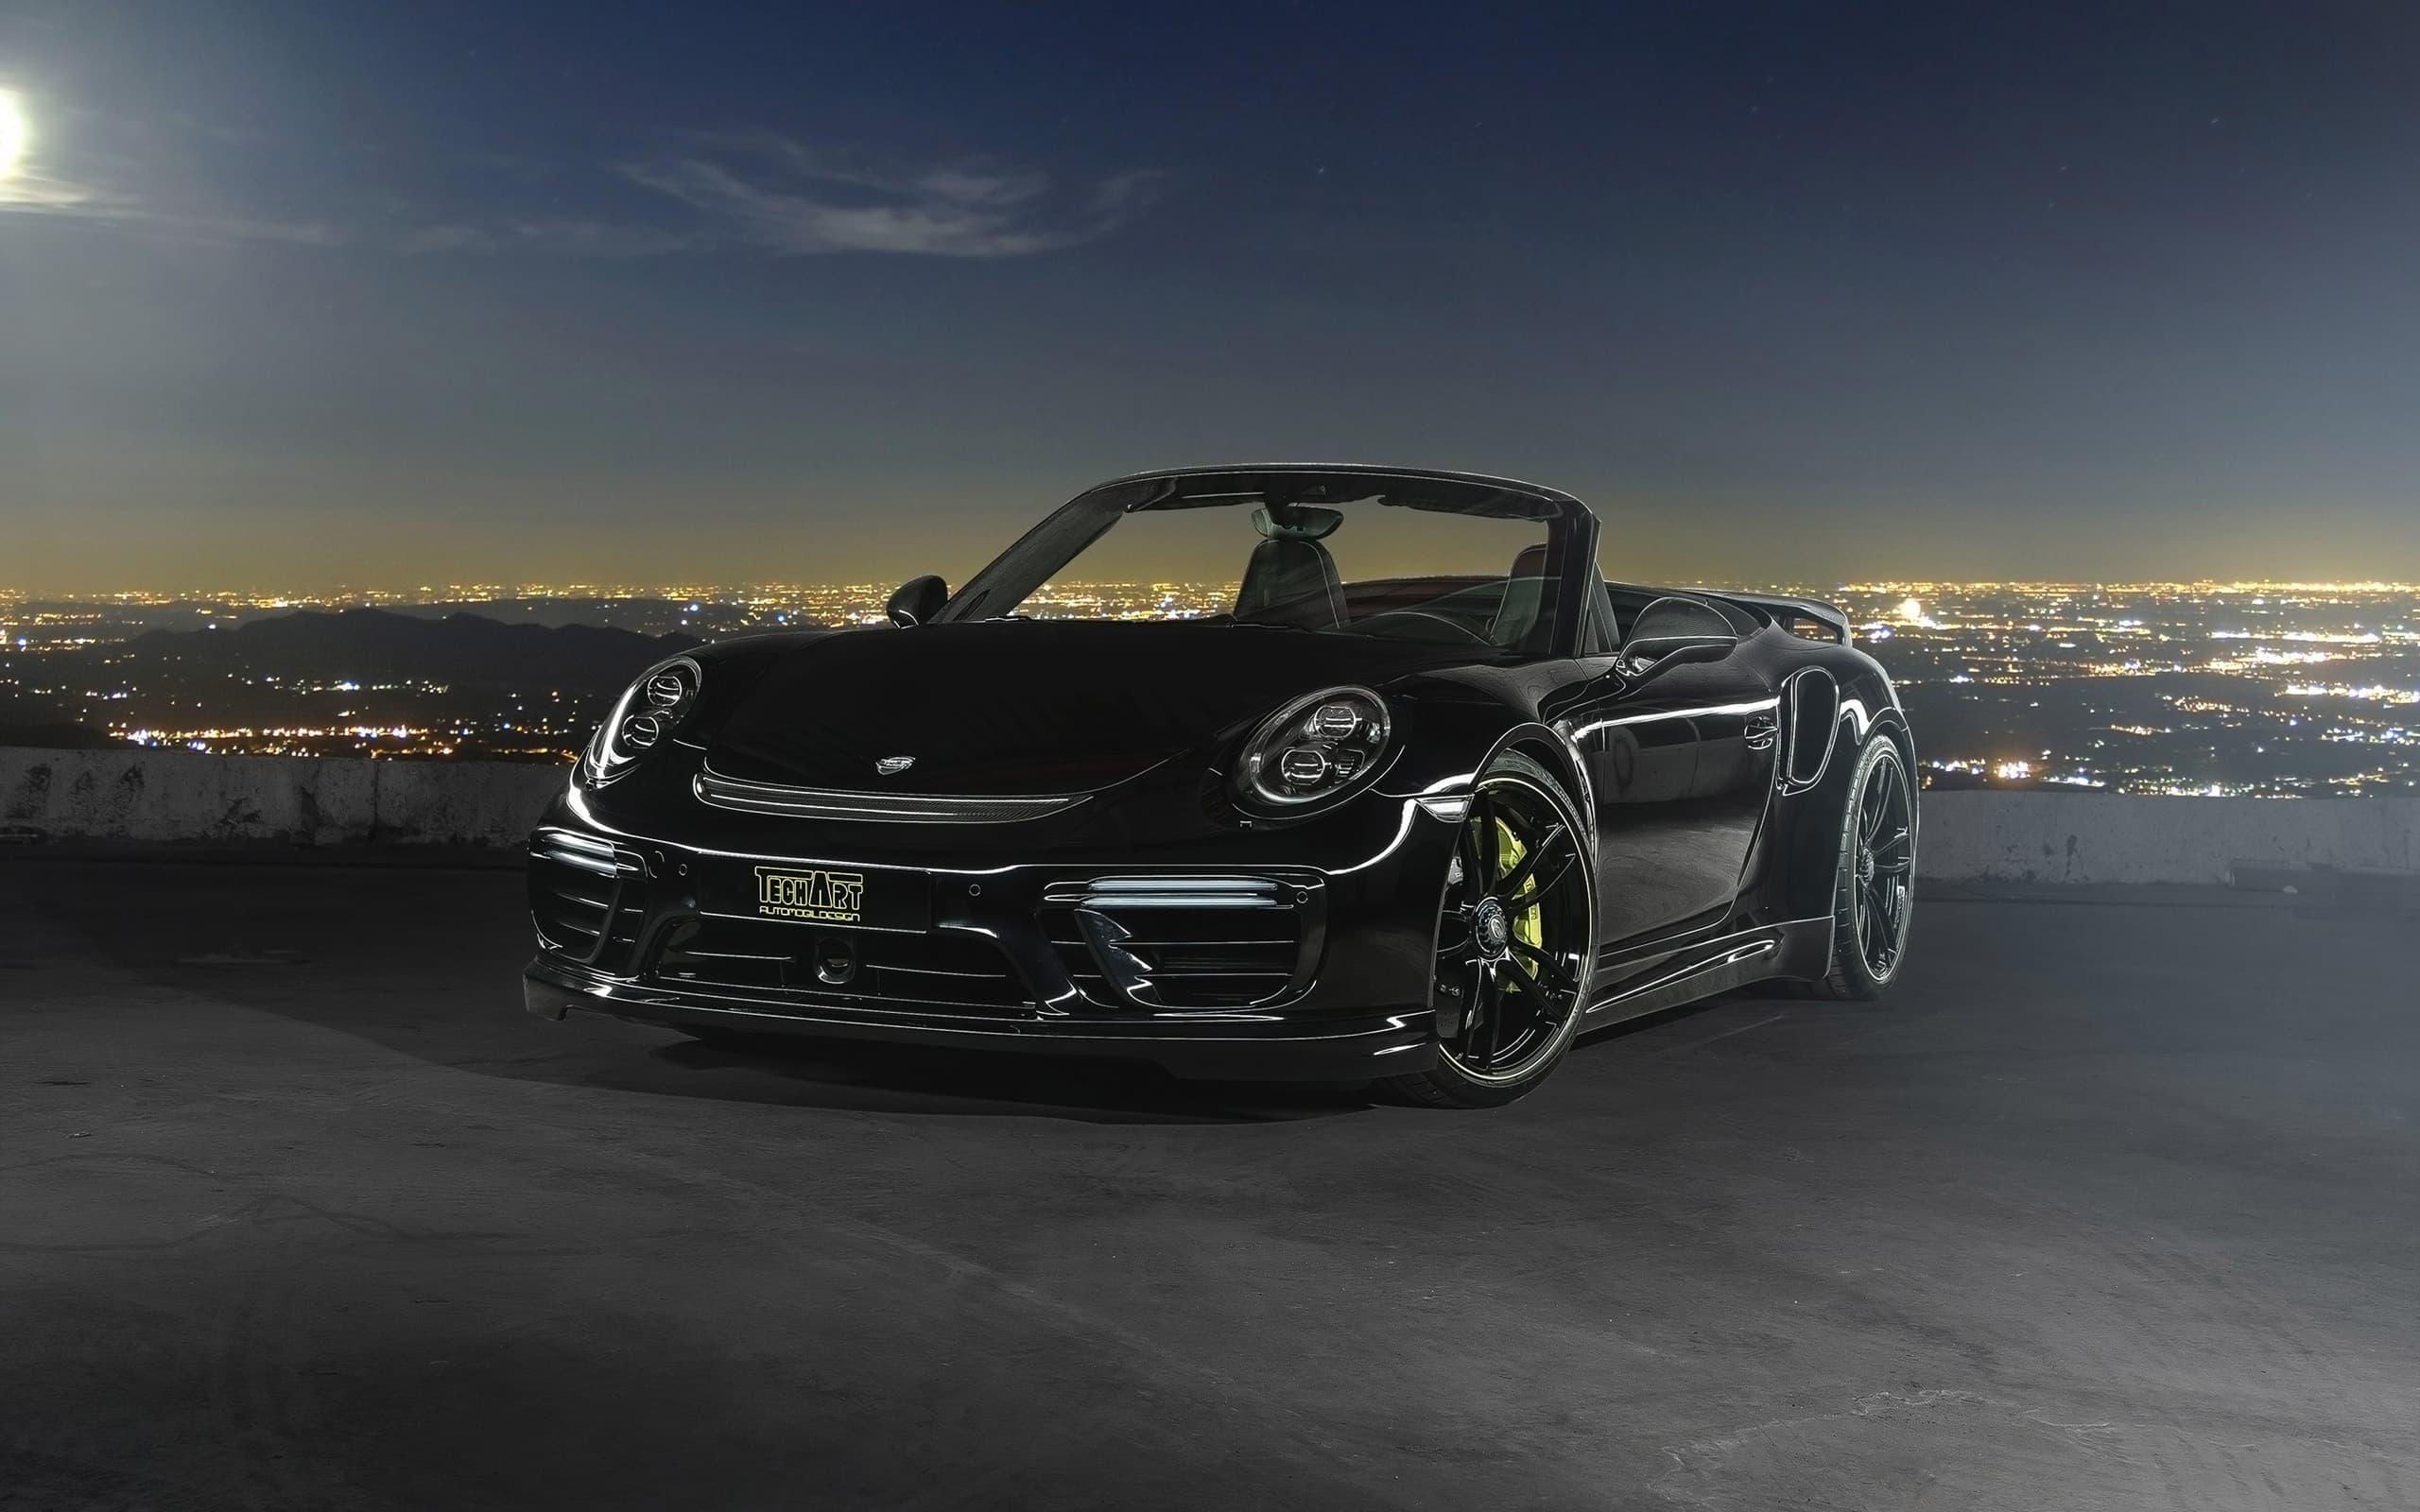 2016 Porsche 911 Cabriolet TechArt Wallpapers HD Black at night 2560x1600